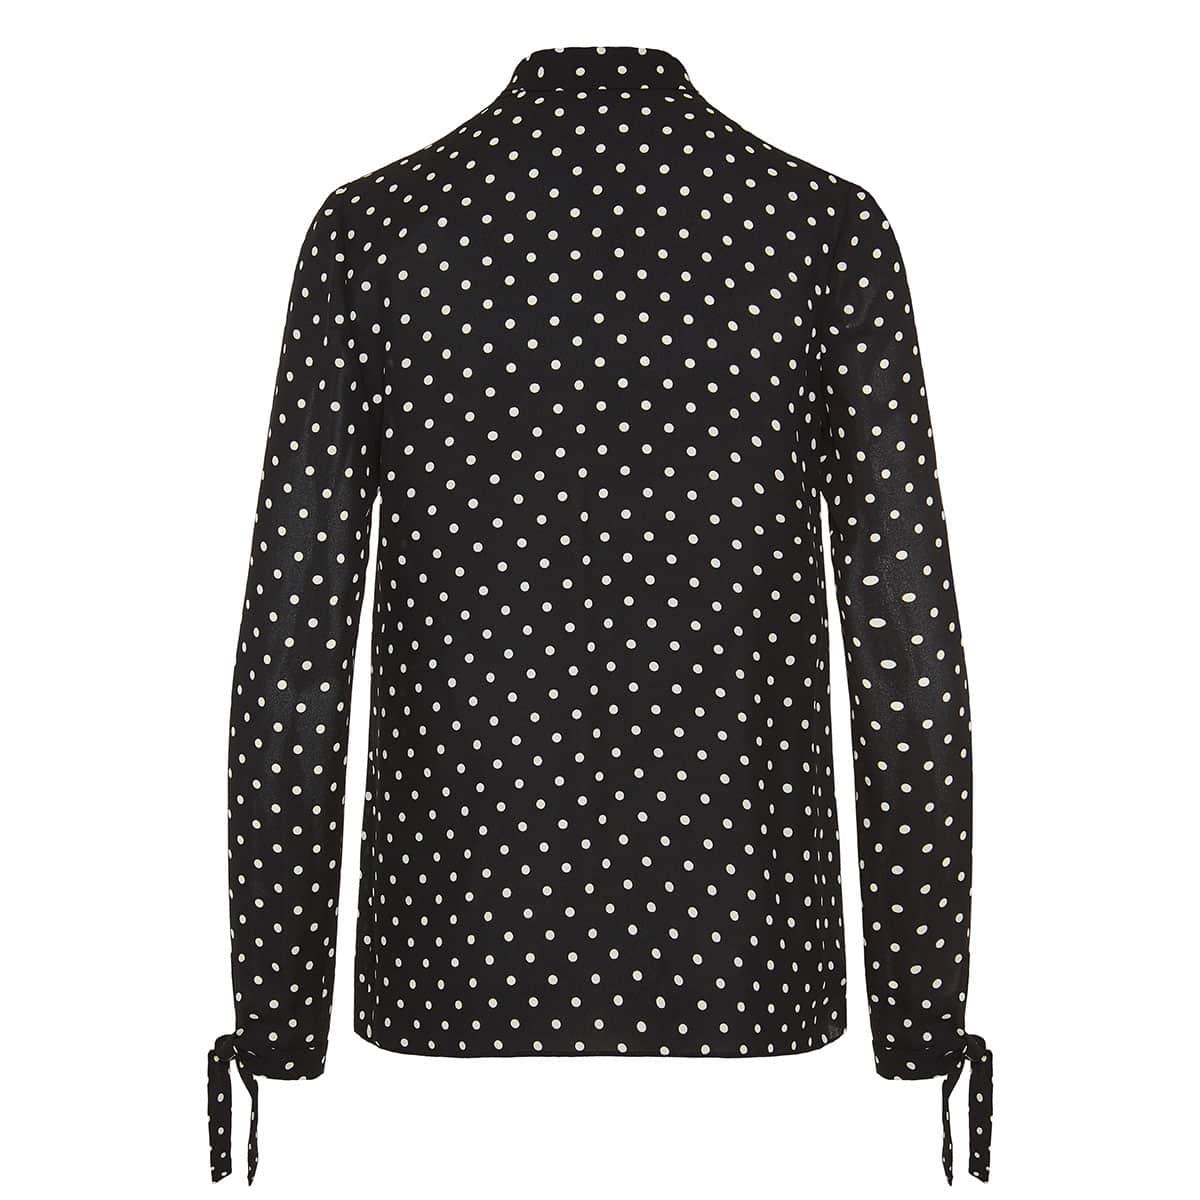 Bow-tie polka-dot blouse